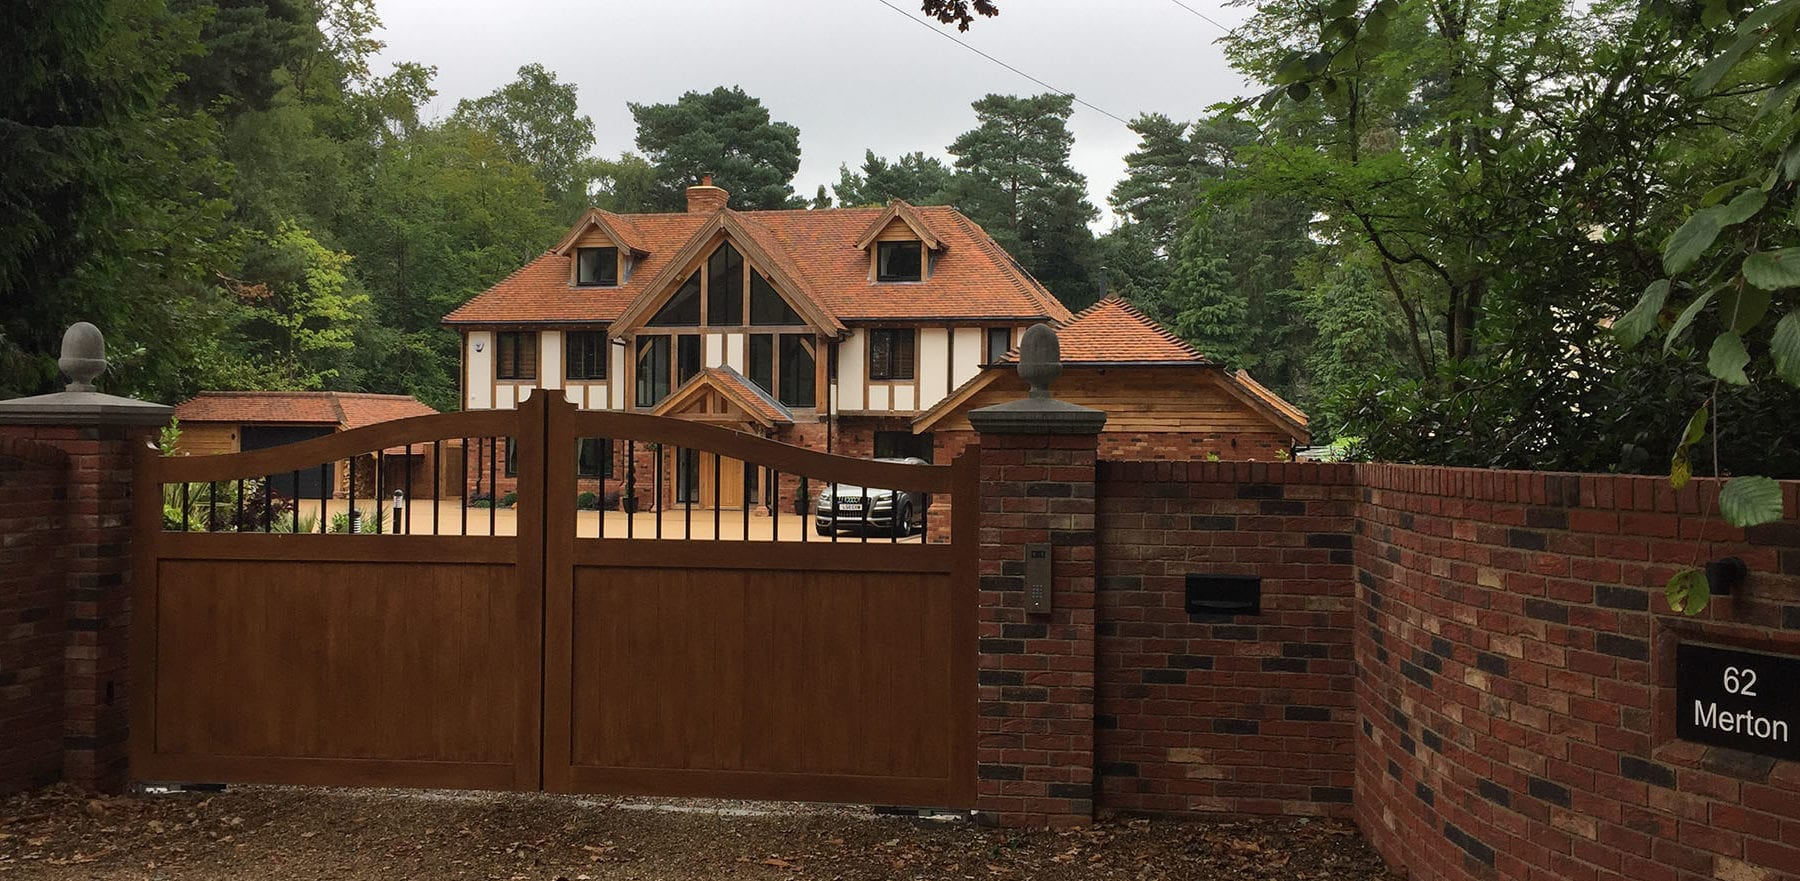 Lifestiles - Handmade Berkshire Clay Roof Tiles - Crowthorne, England 5